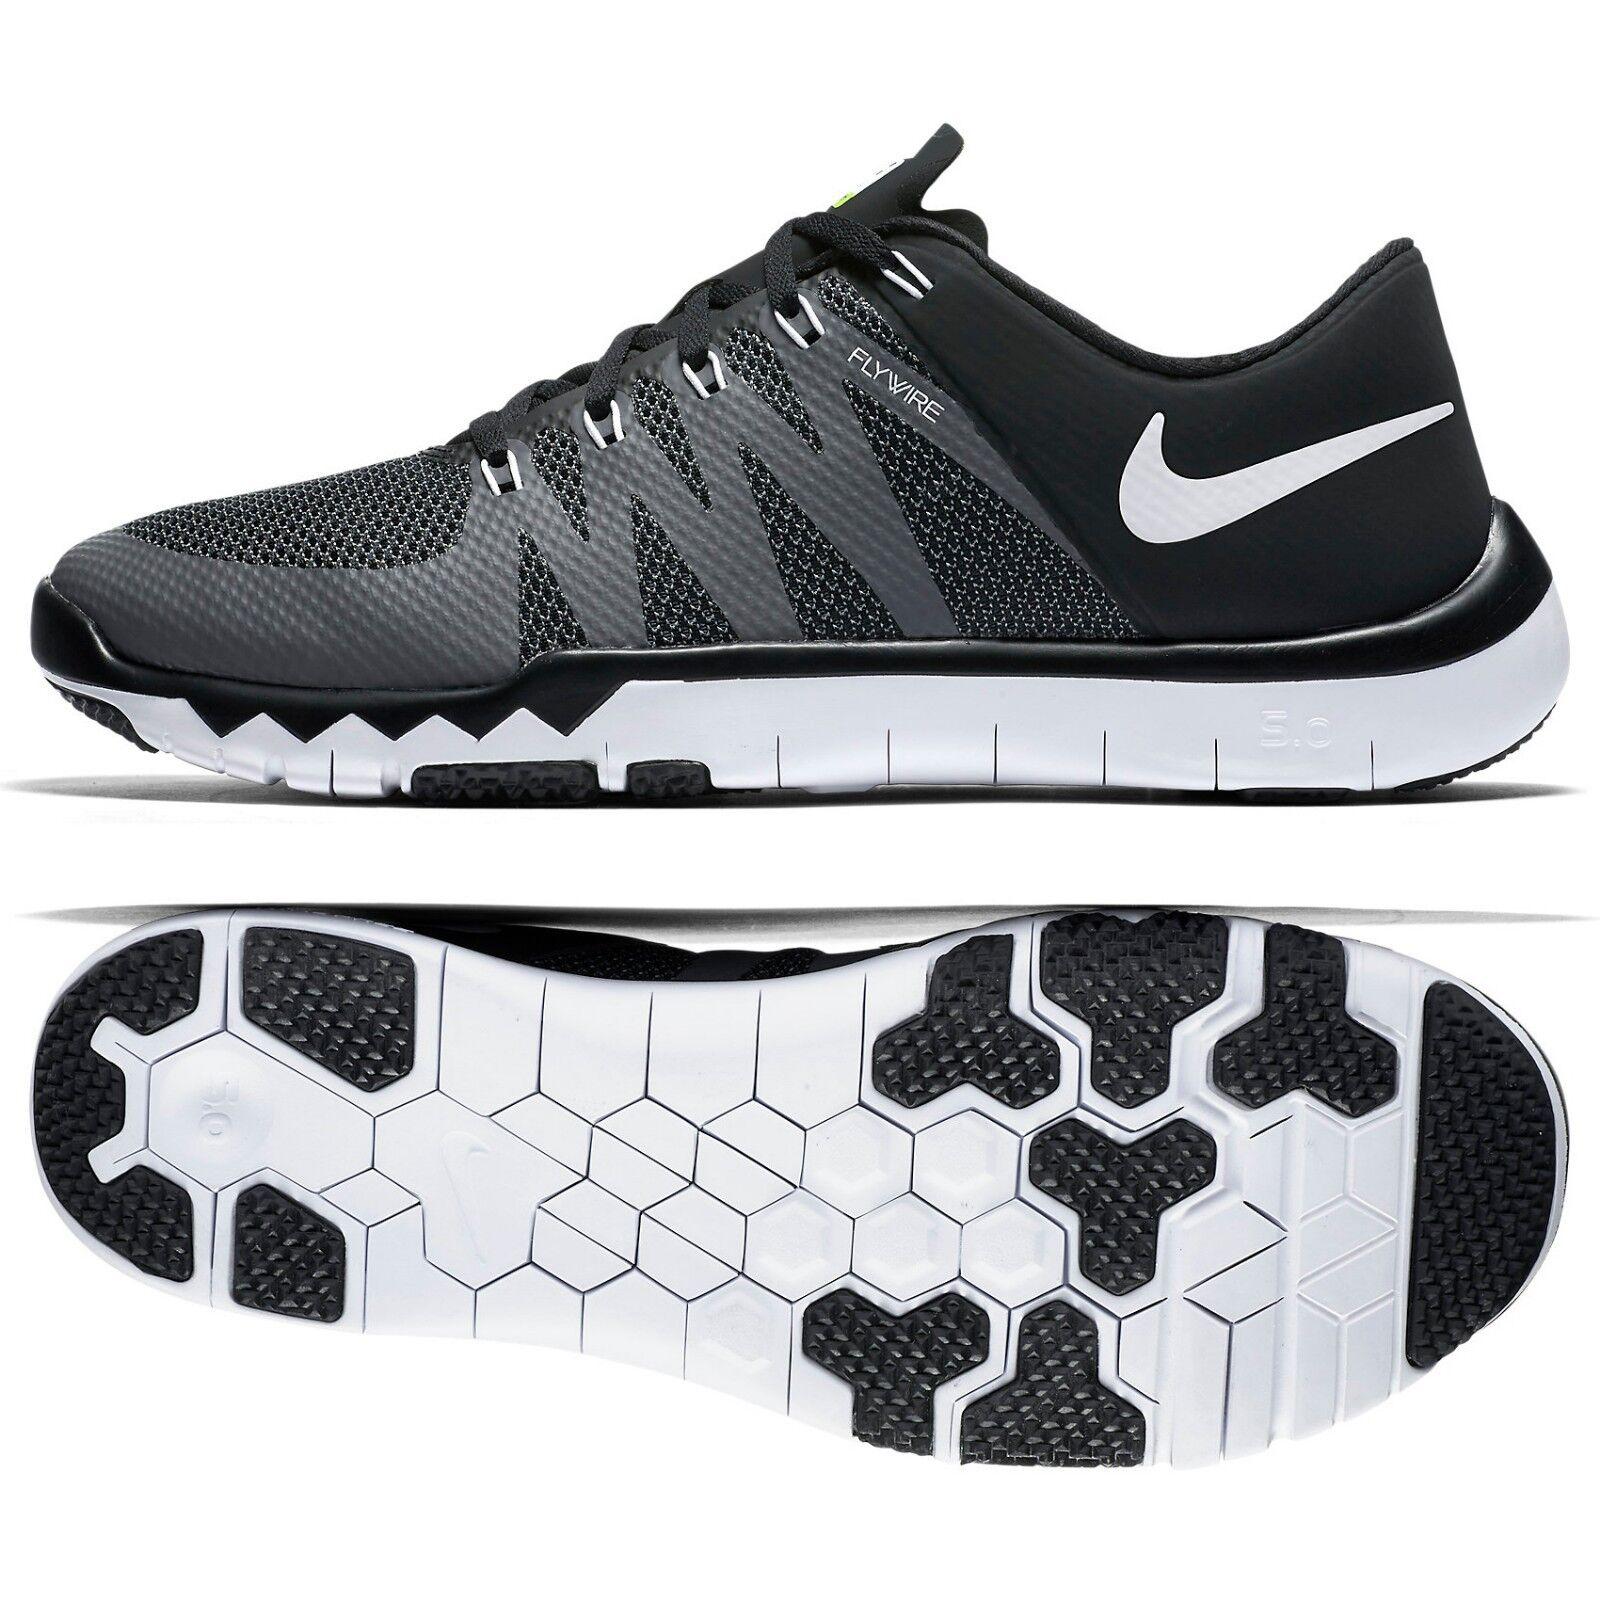 Nike Free Trainer 5.0 V6 719922-010 Black Dark Grey White Men's Training shoes